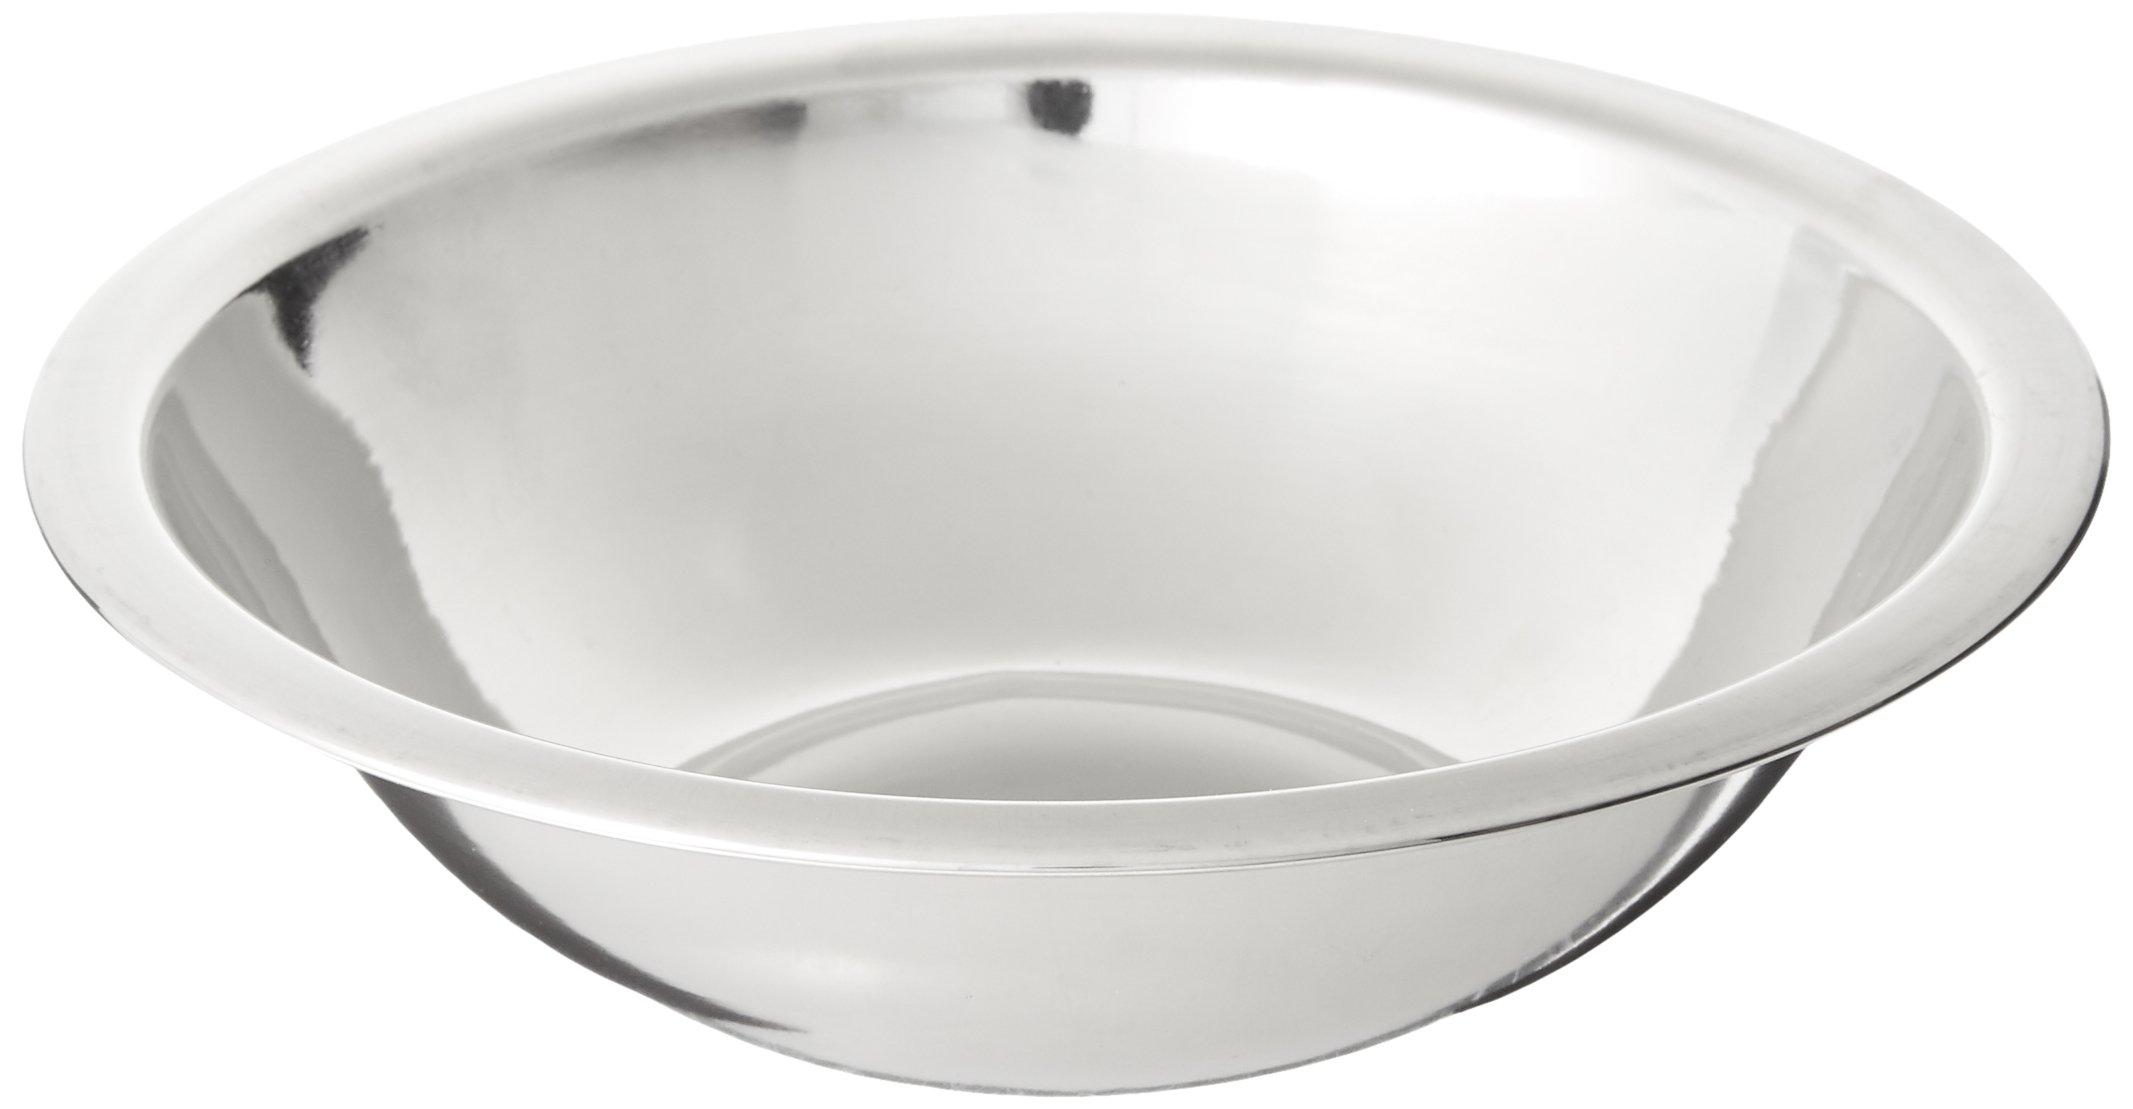 Winco MXB-75Q Mixing Bowl, 3/4-Quart